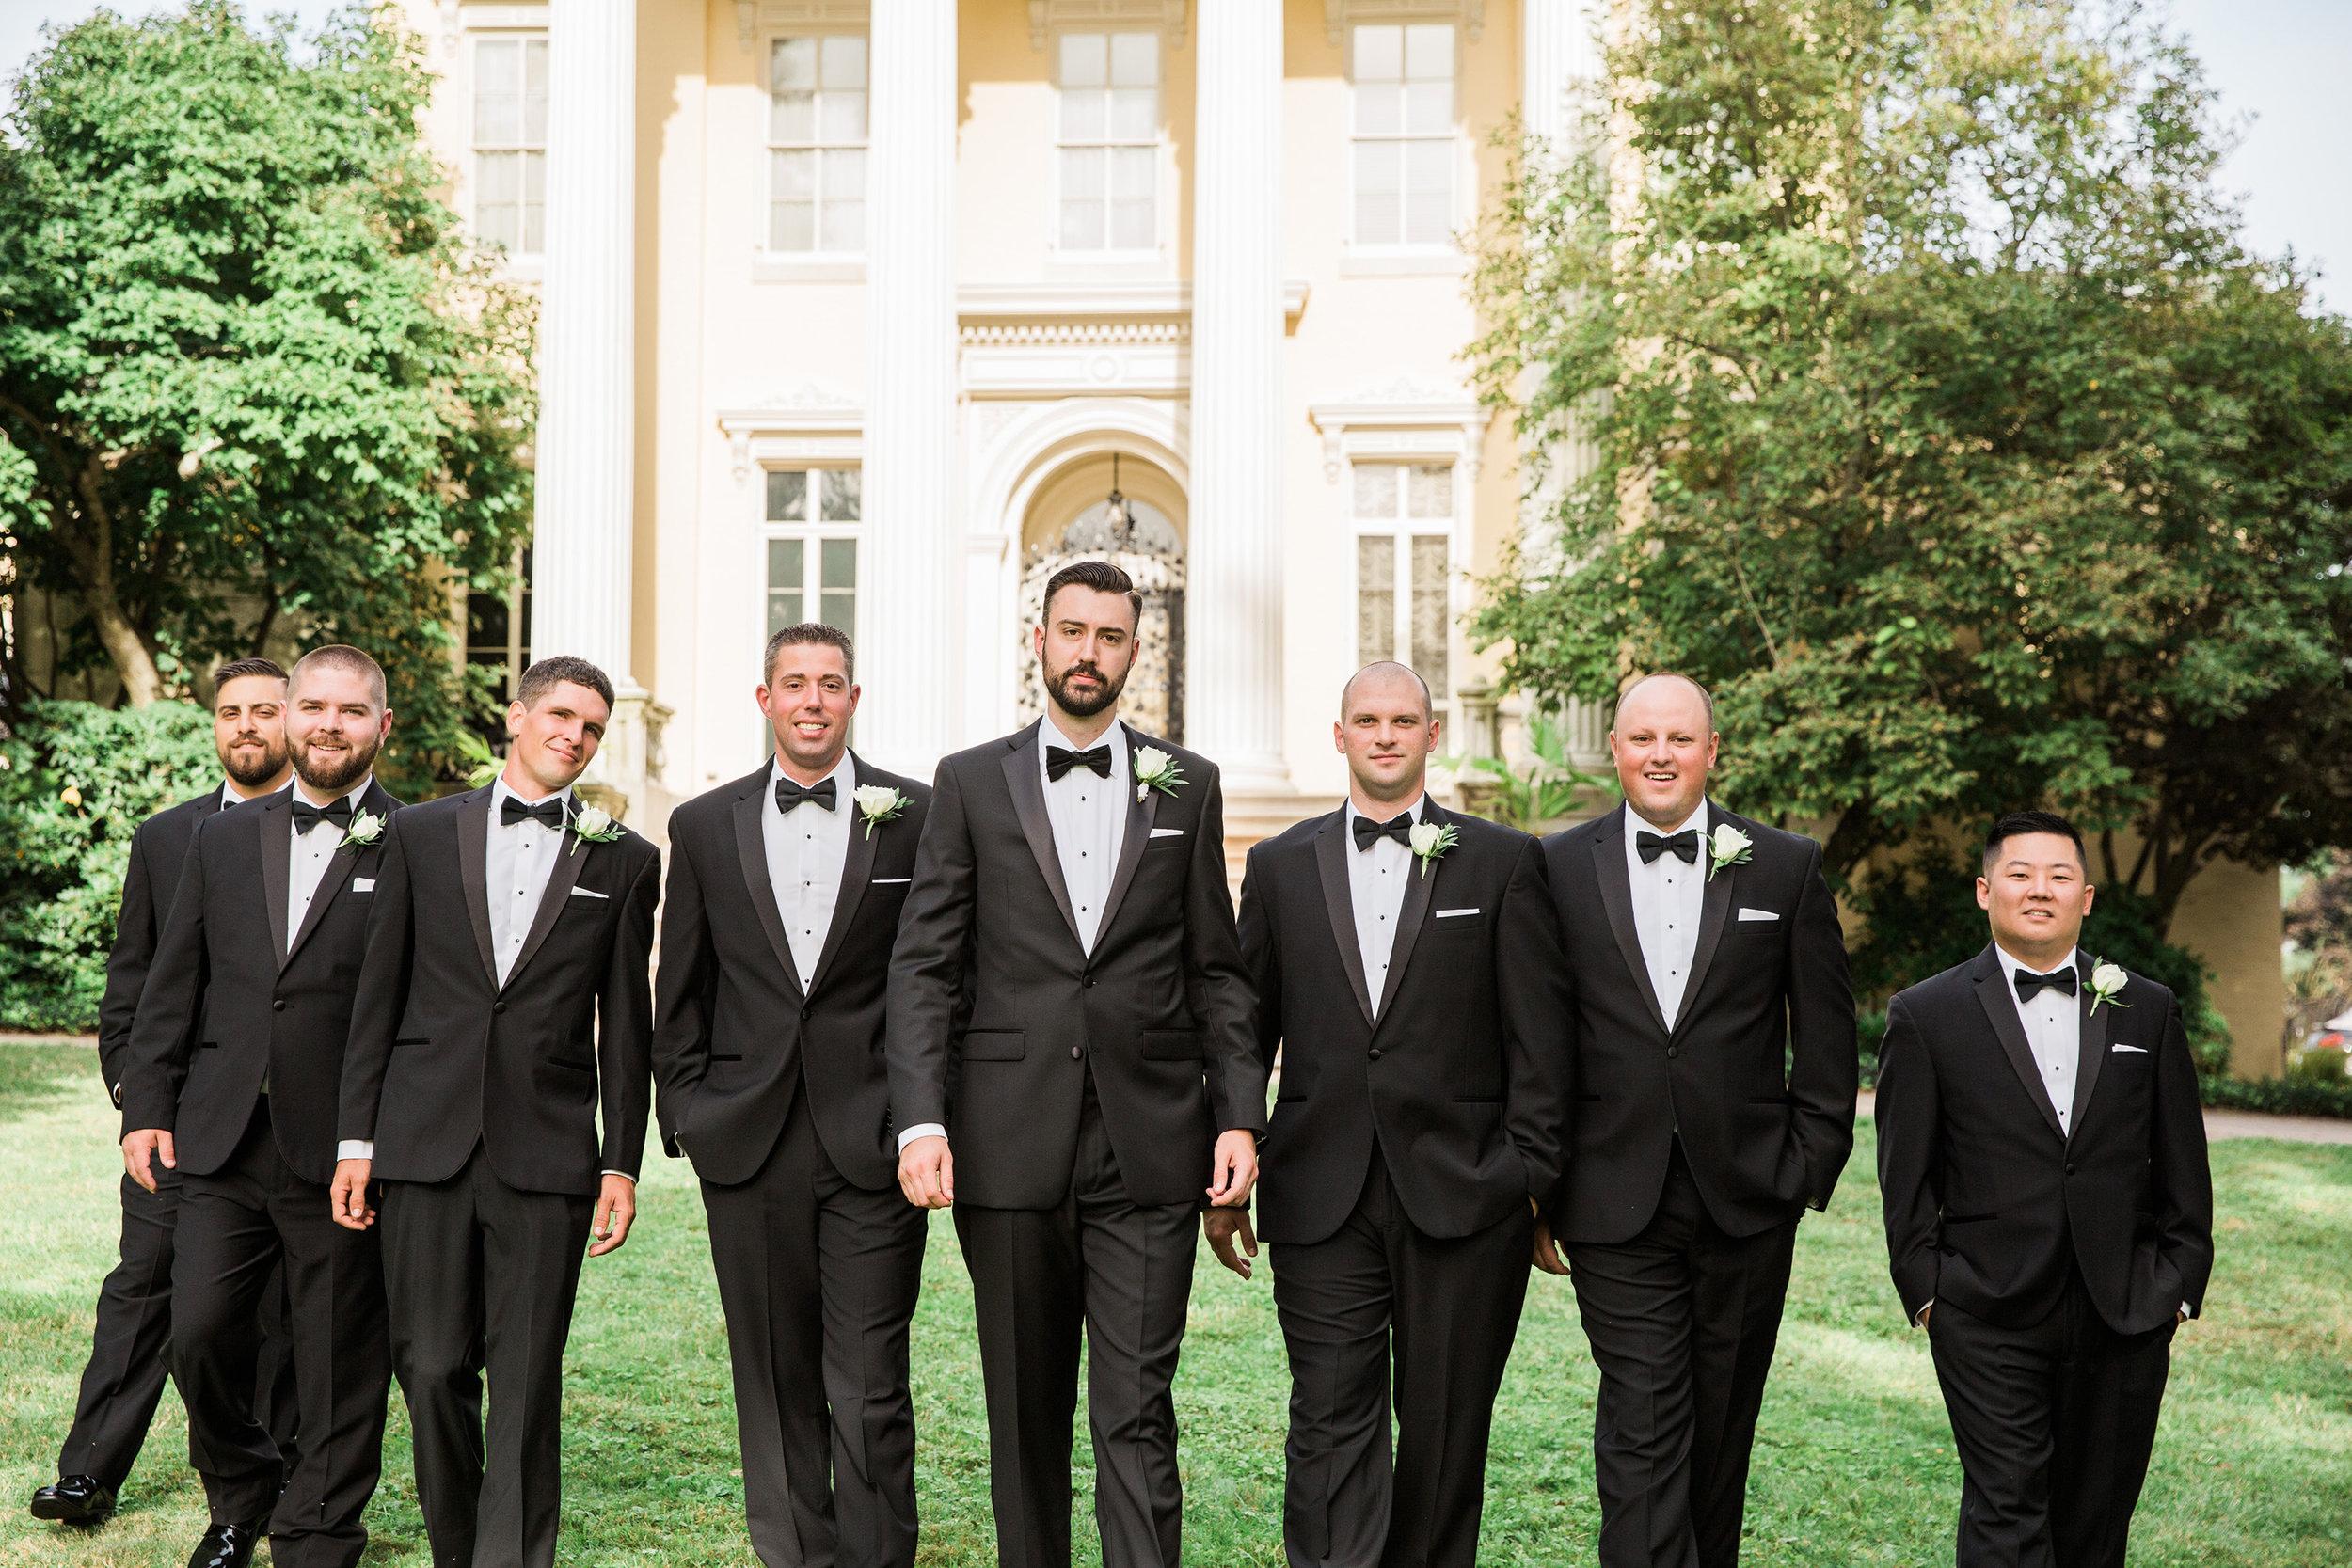 Evergreen-Museum-Balitmore-Maryland-Wedding-Black-Tie-Bride-014.jpg